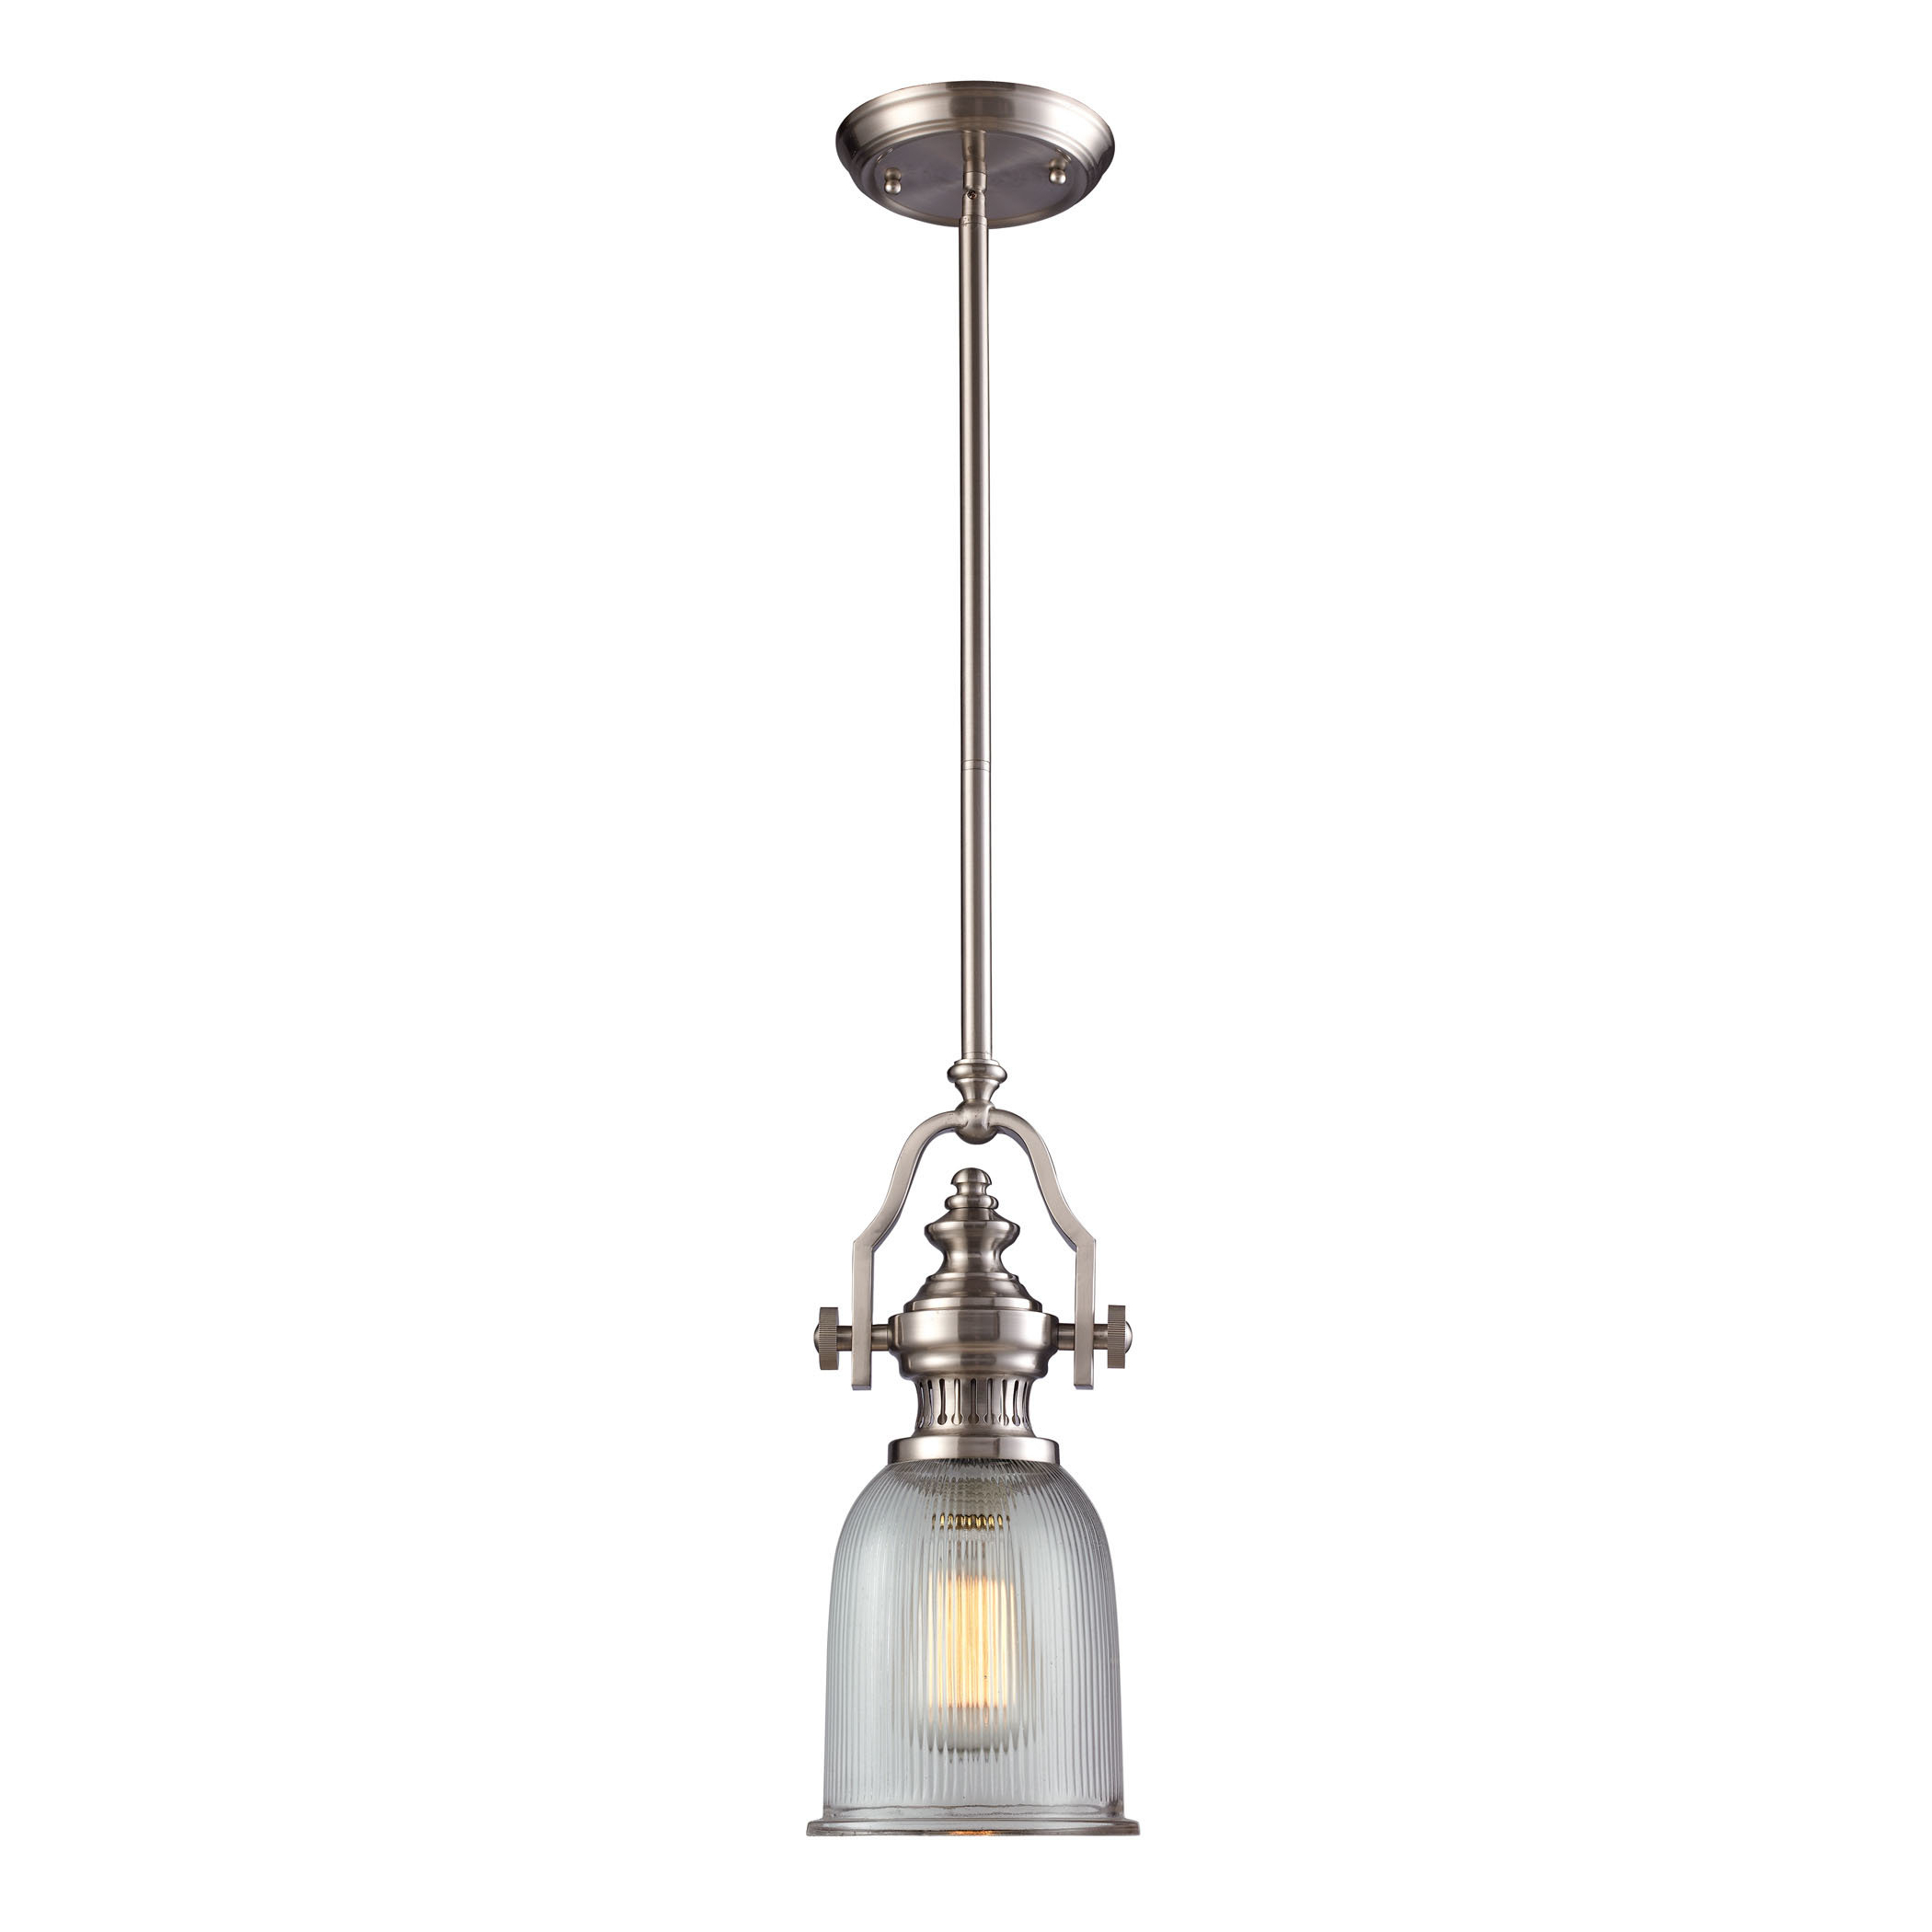 Birch Lane™ Heritage Erico 1 Light Single Bell Pendant In Newest Spokane 1 Light Single Urn Pendants (View 6 of 20)